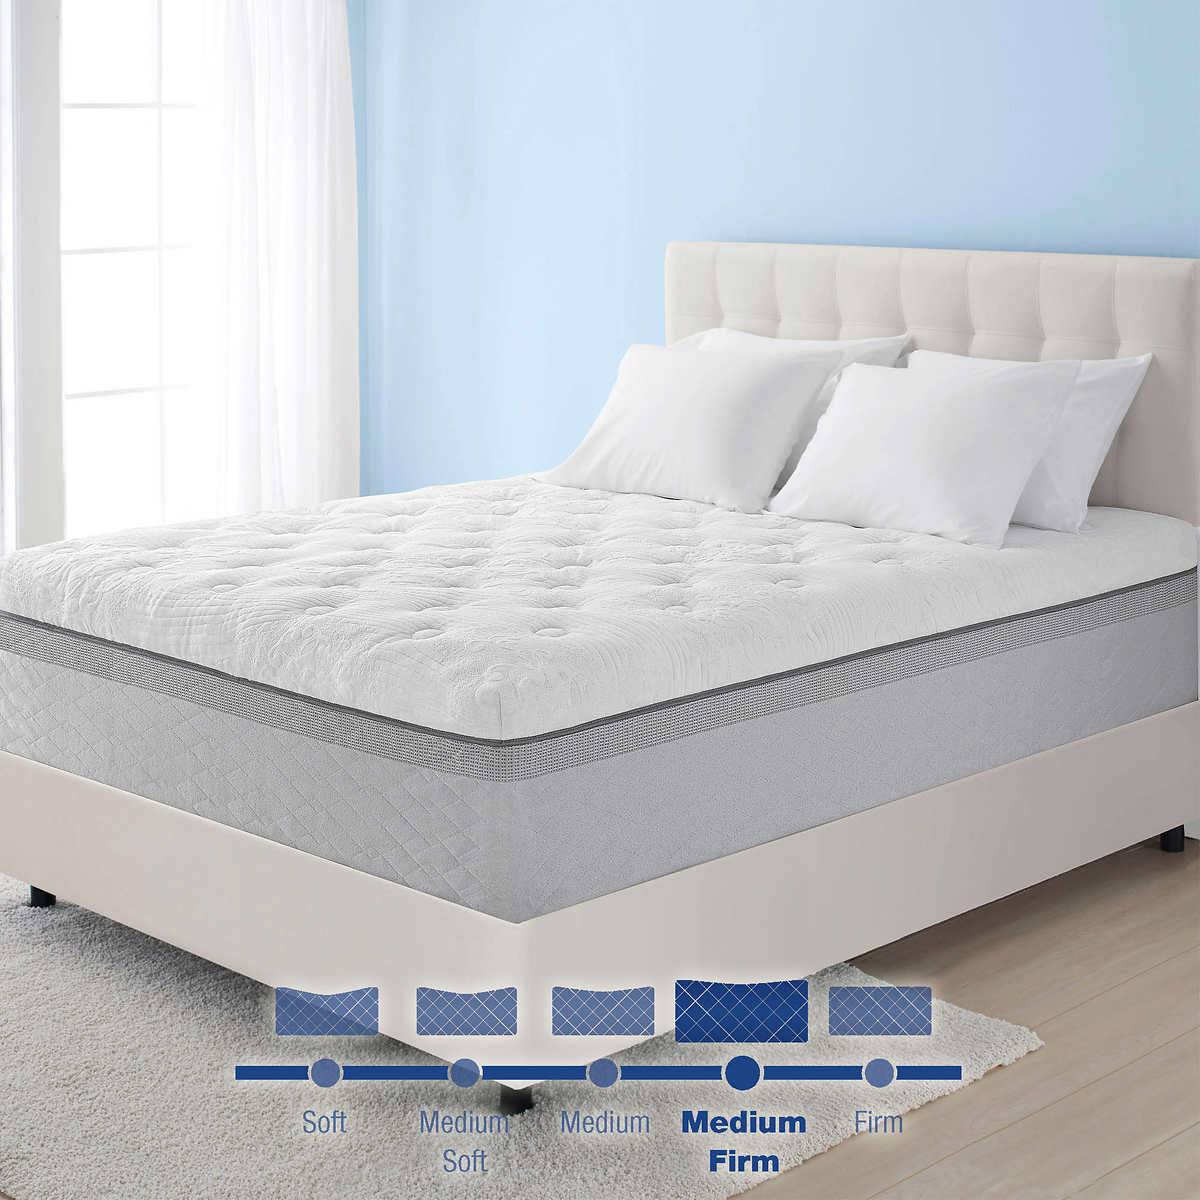 Novaform Comfort Grande Gel Memory Foam Twin Mattress